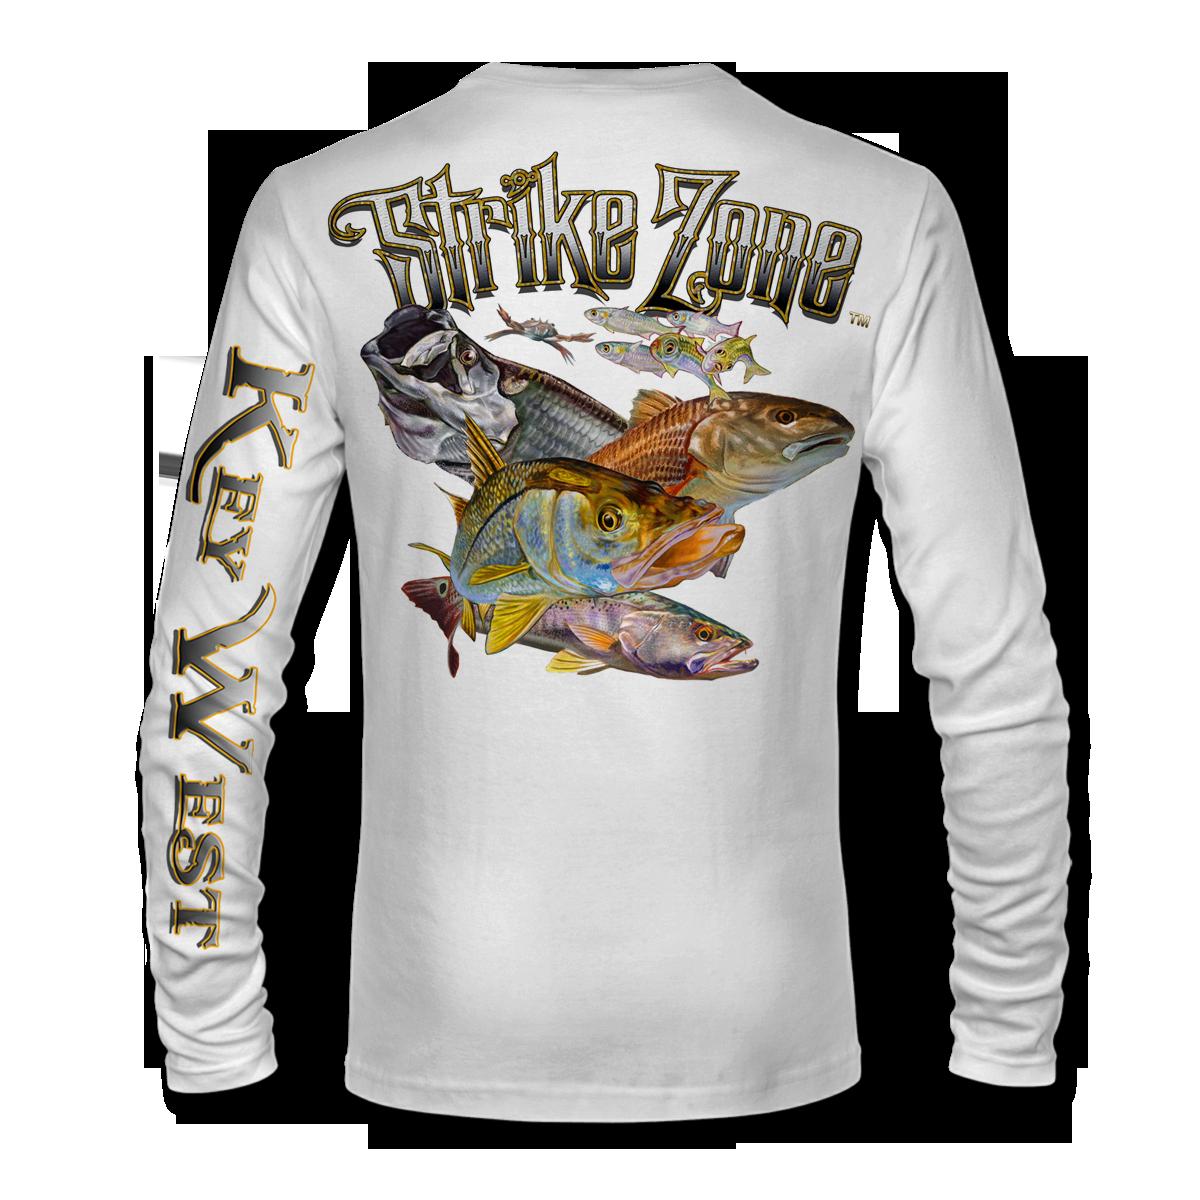 jason-mathias-strike-zone-inshore-slam-fishing-shirt-white-back.png